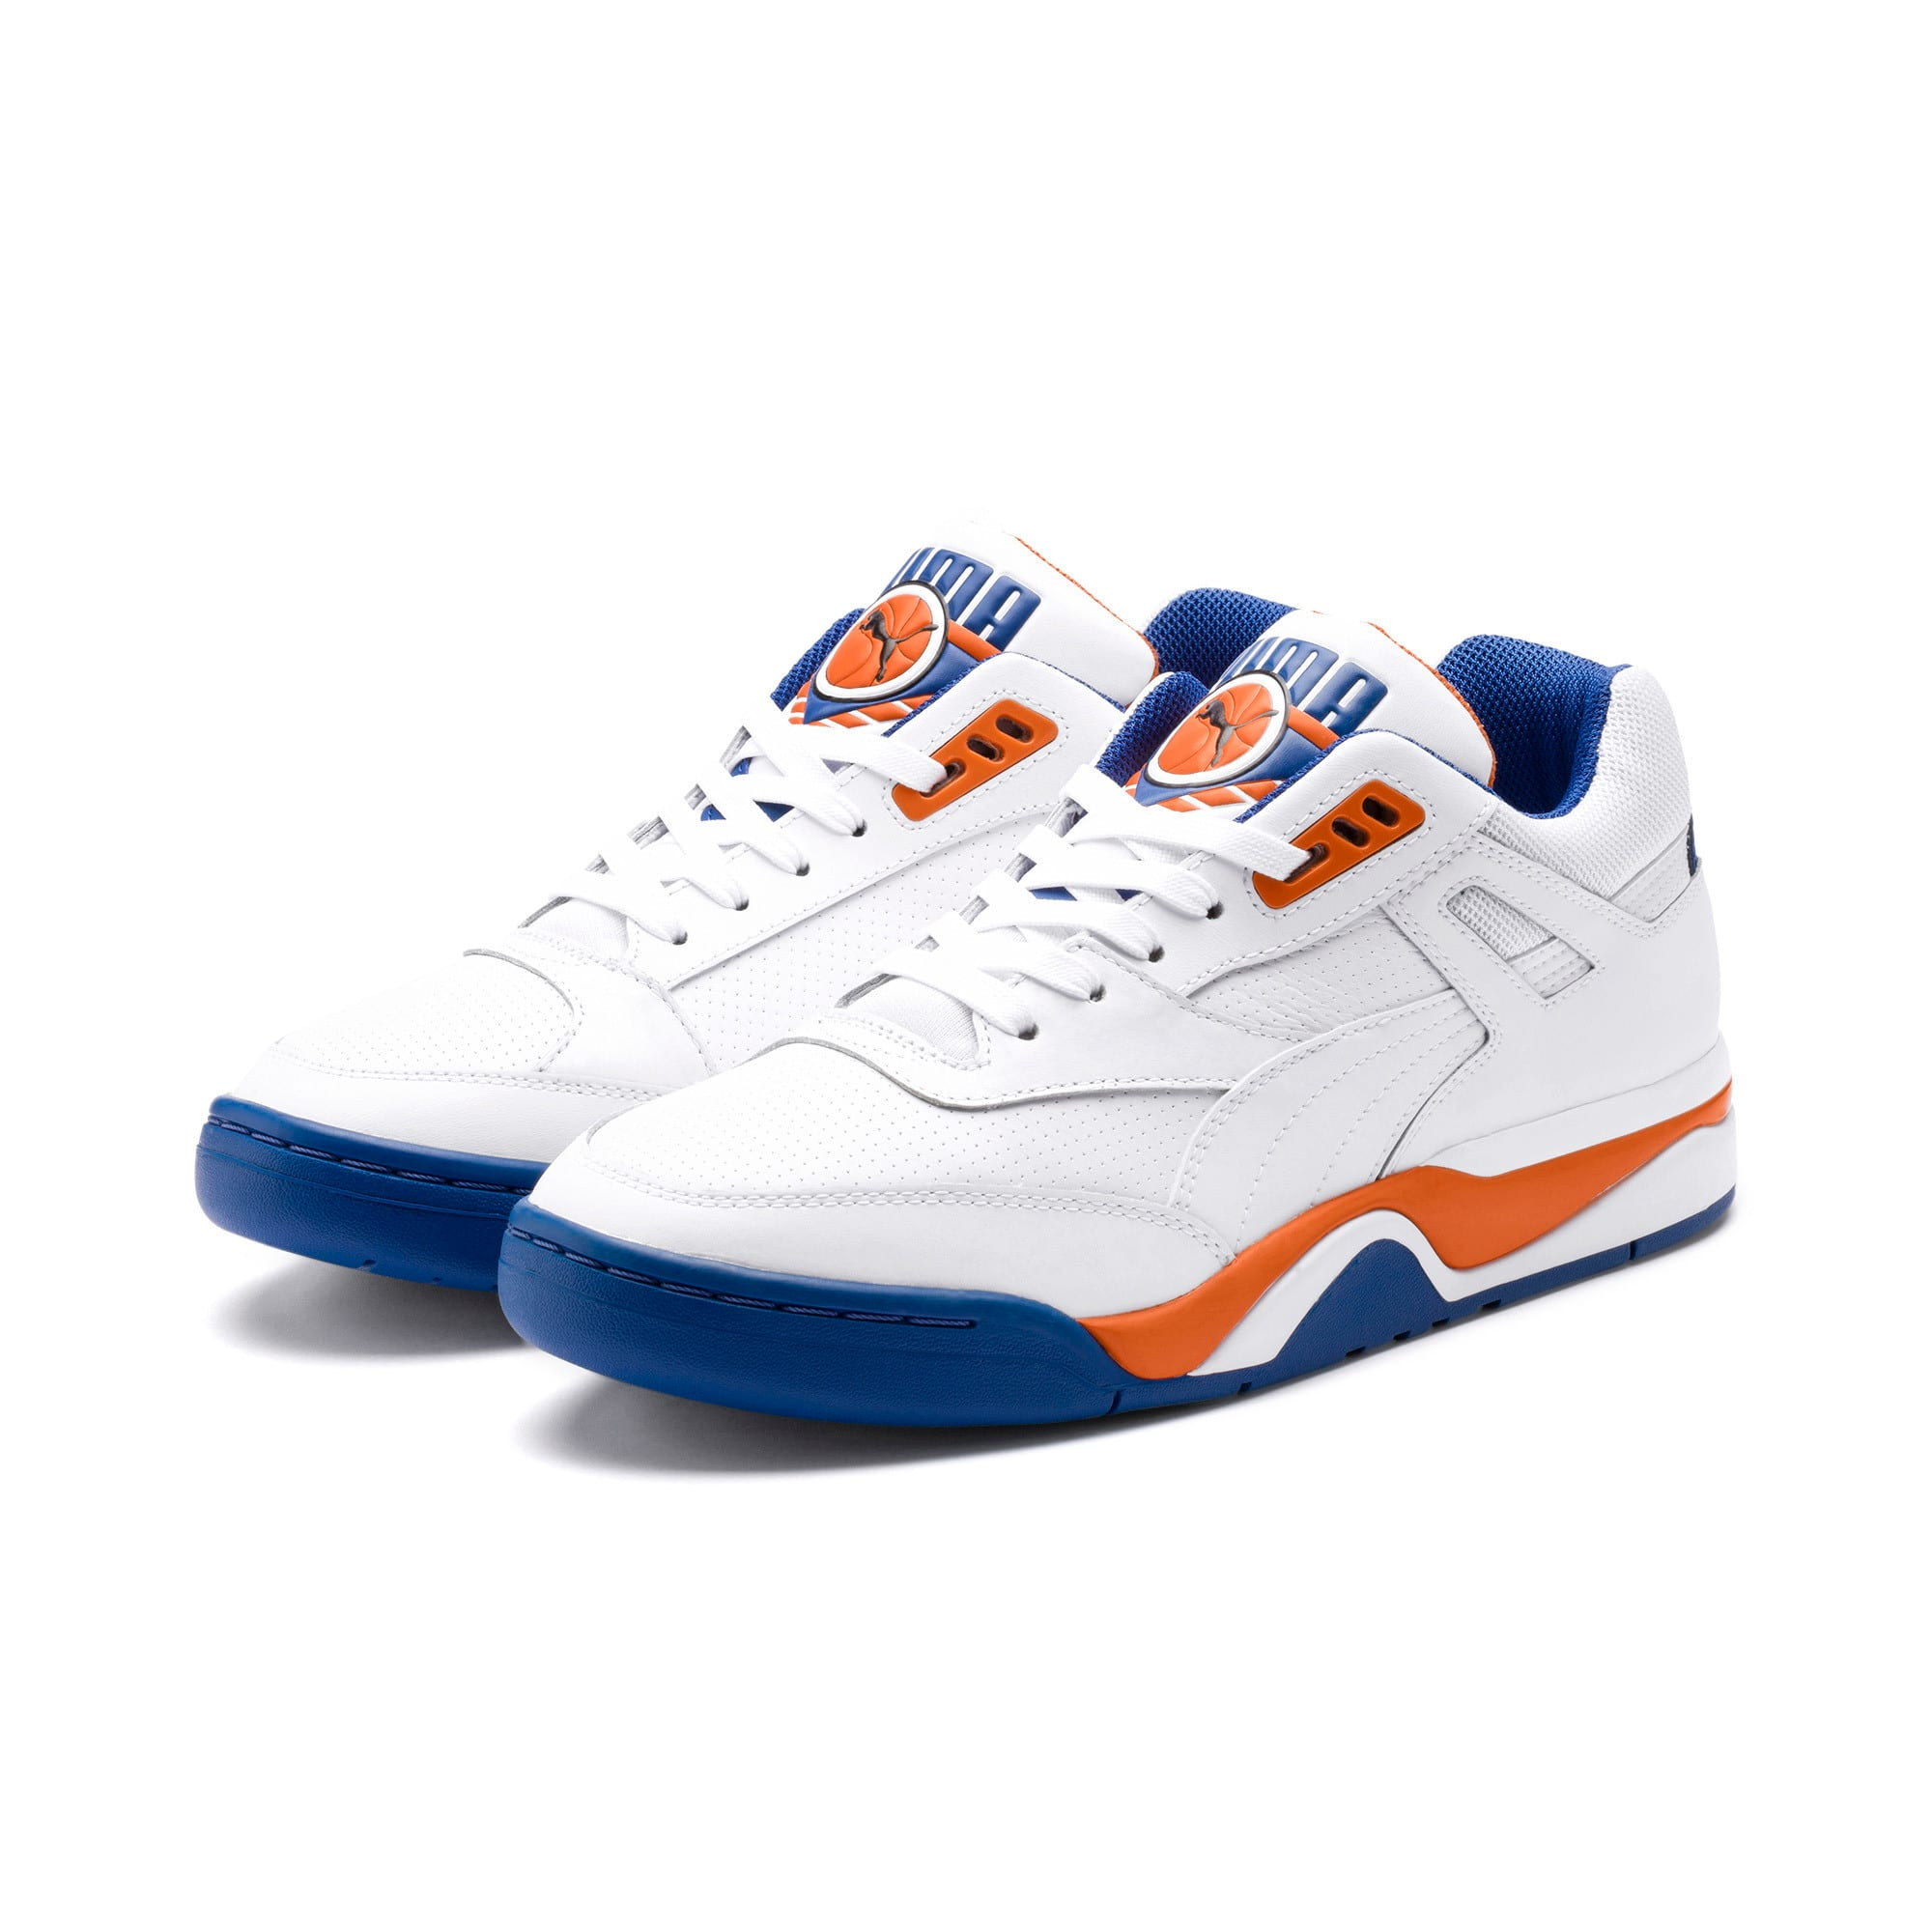 Thumbnail 2 of Palace Guard basketbalschoenen voor heren, P White-Jaffa Orange-G Blue, medium